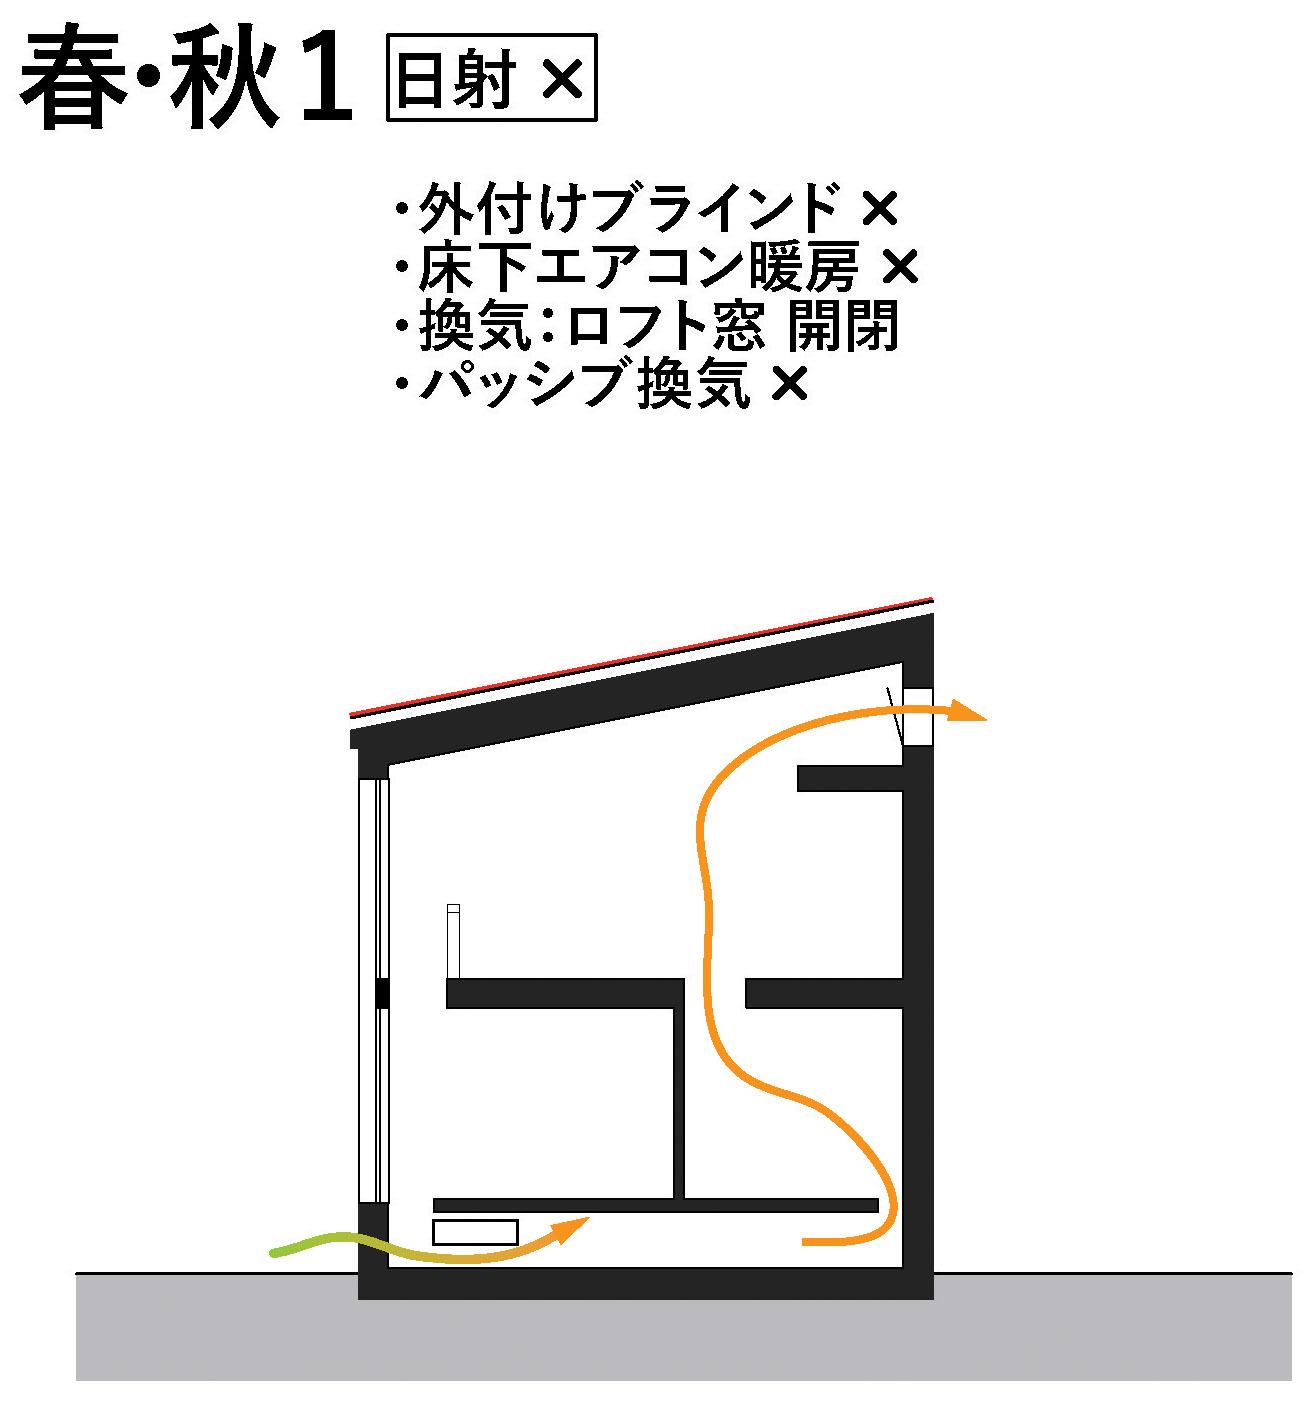 RealZEH・Q1住宅モデル能代:暖冷房換気モード春秋_e0054299_13064097.jpg